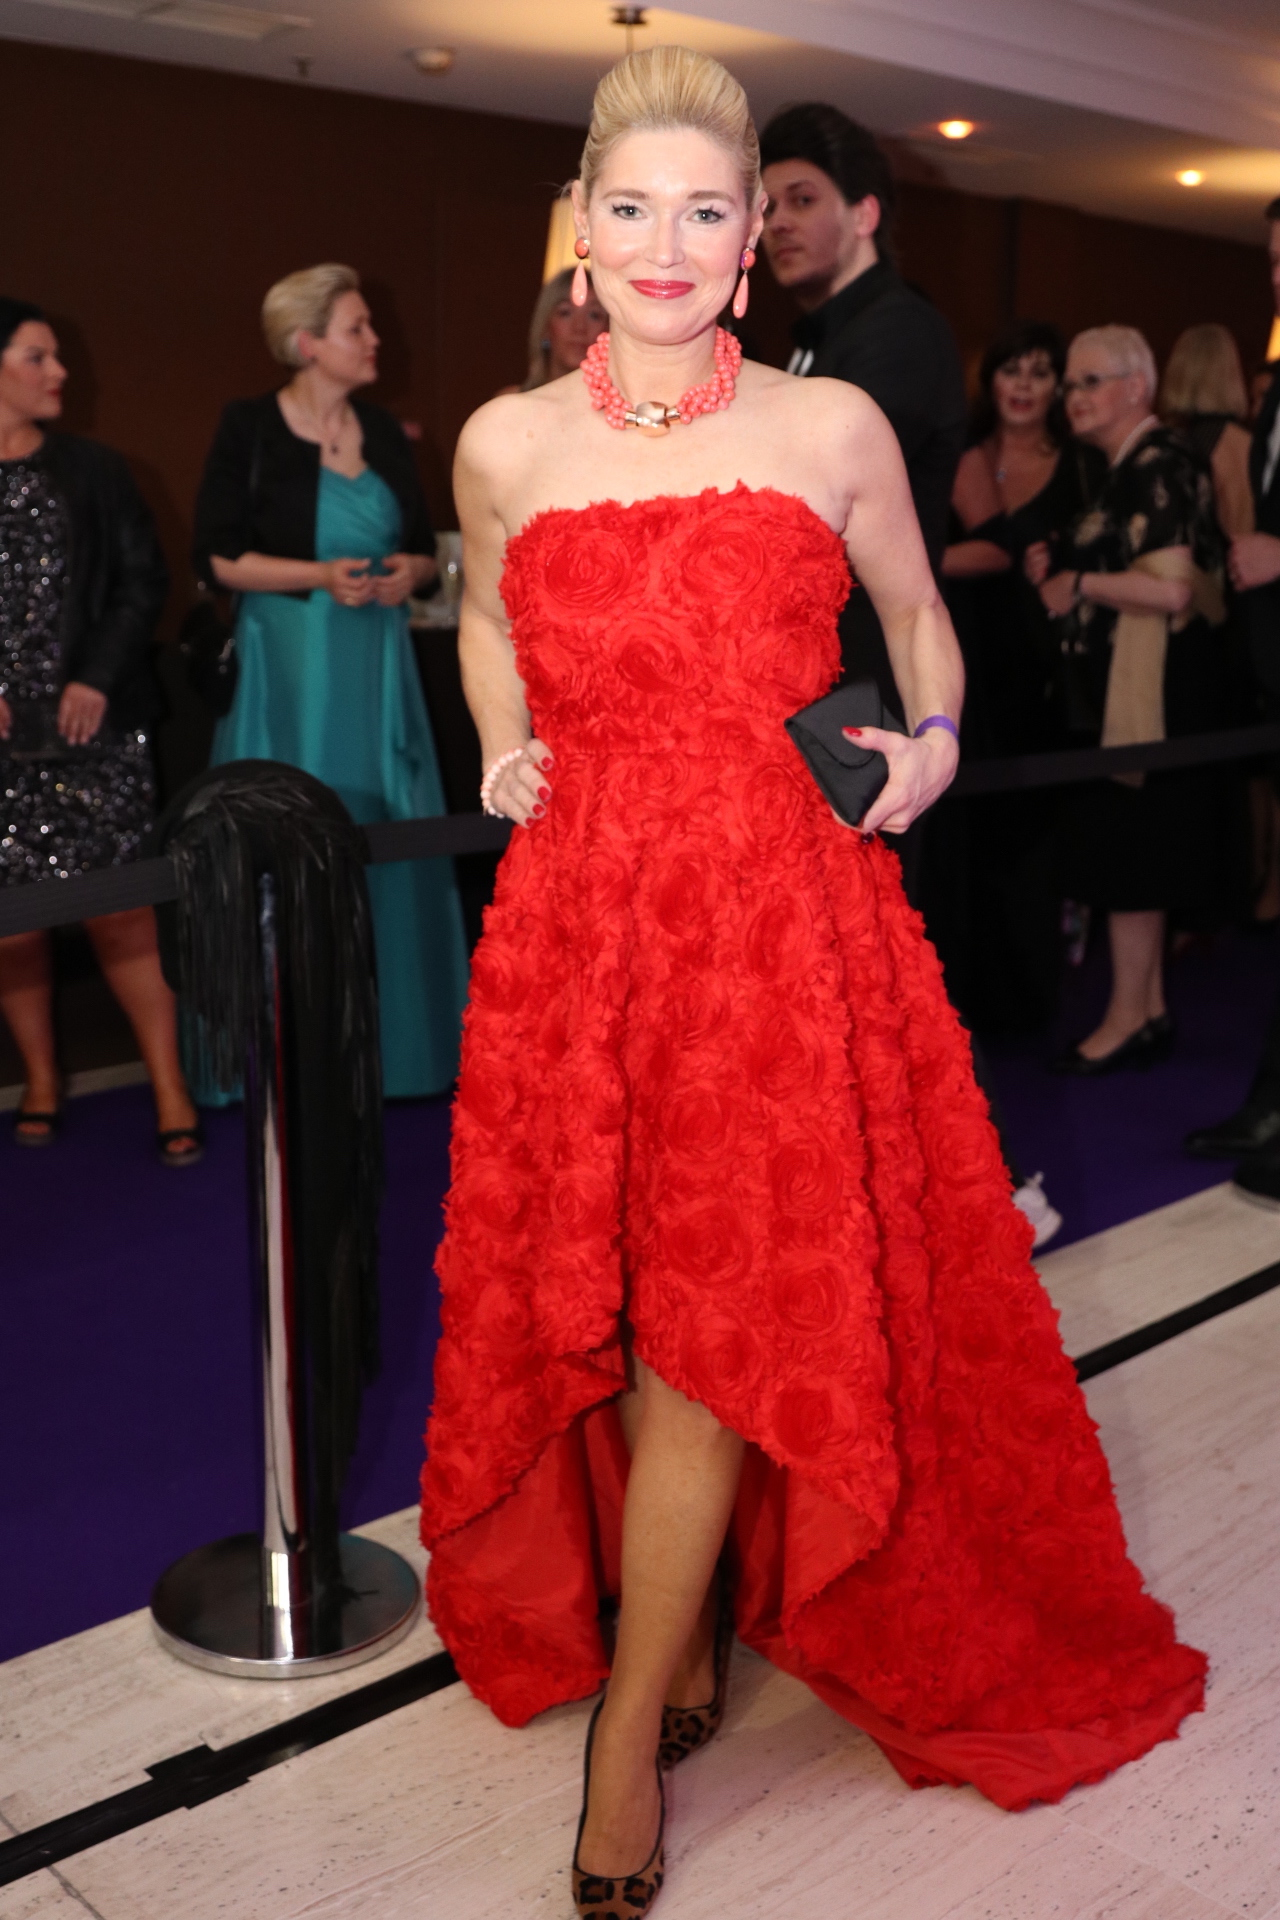 Petra Dieners Lieblingsstil, Matsouri Kleid, Ballkleid rot, Abendkleid rot, Fashion-Blog, Lieblingsstil.com, Brauksiepe Schmuck,